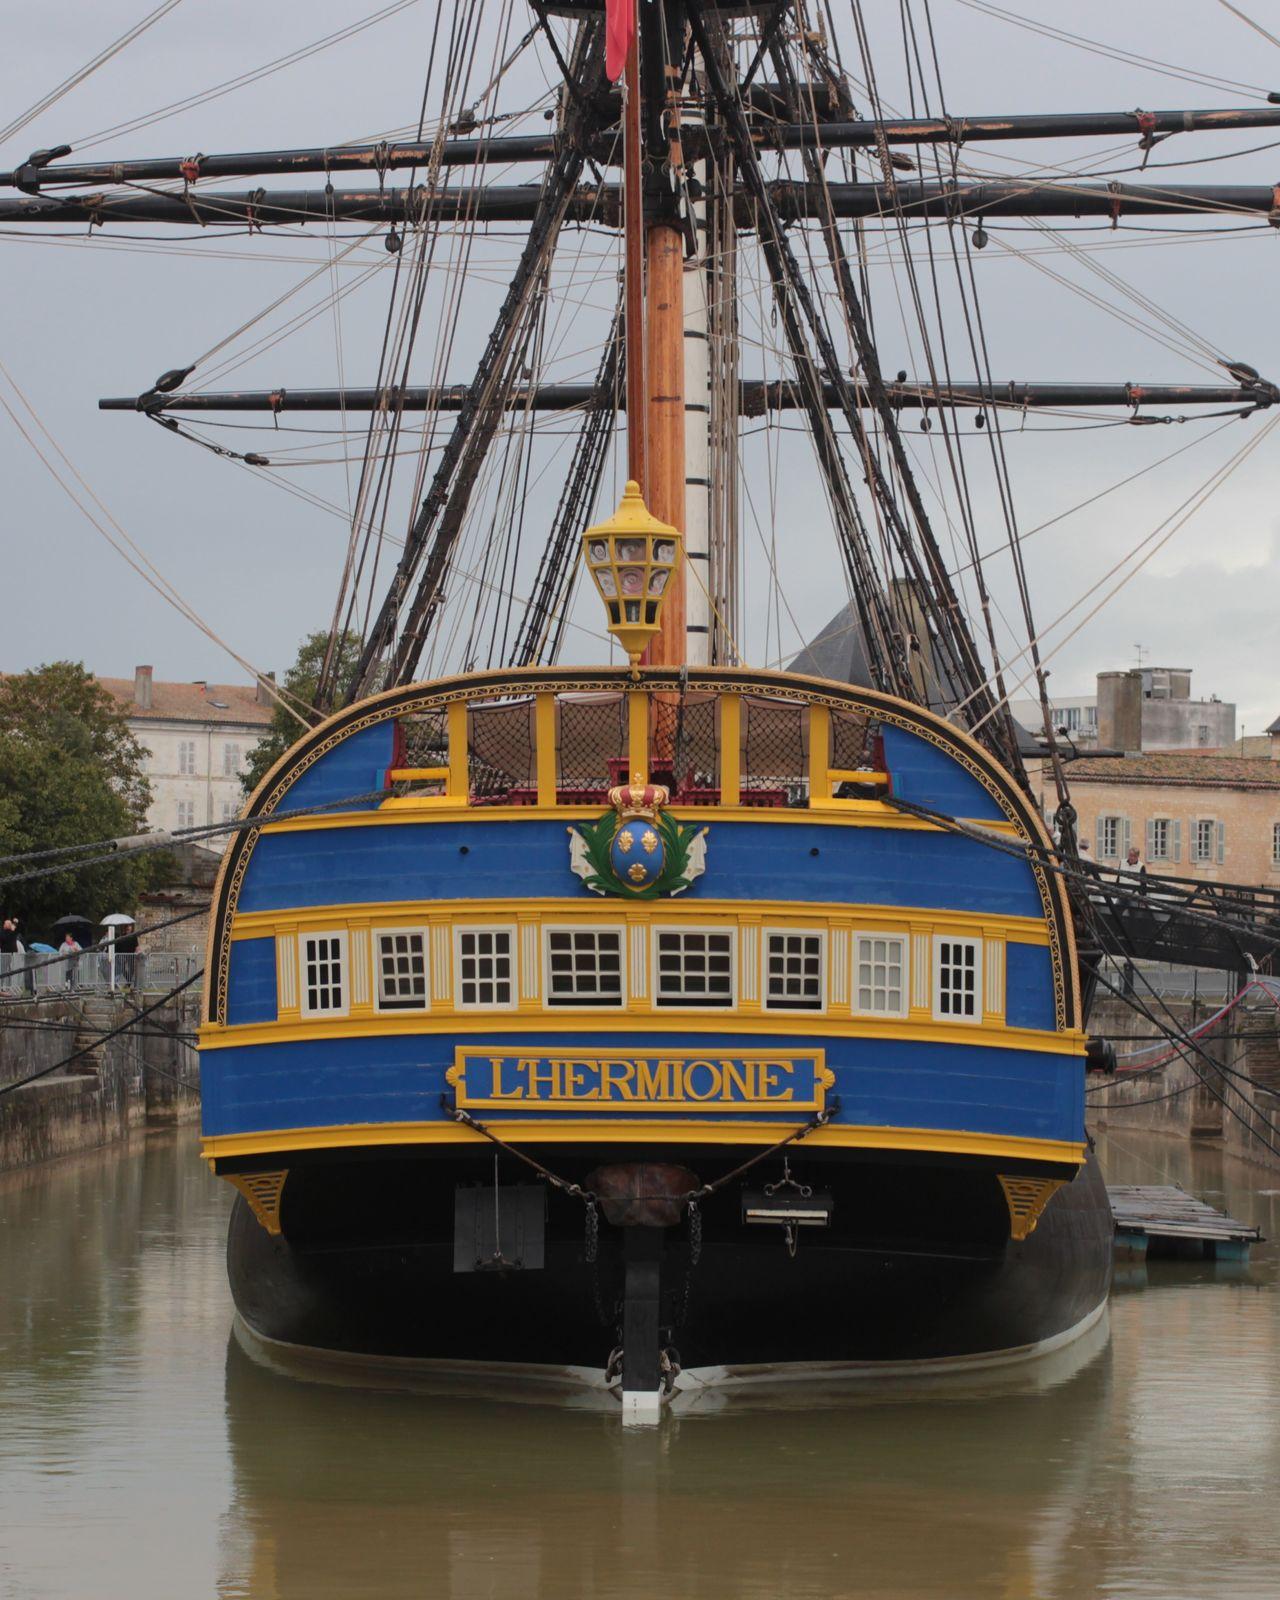 Hermione Fregate Boat